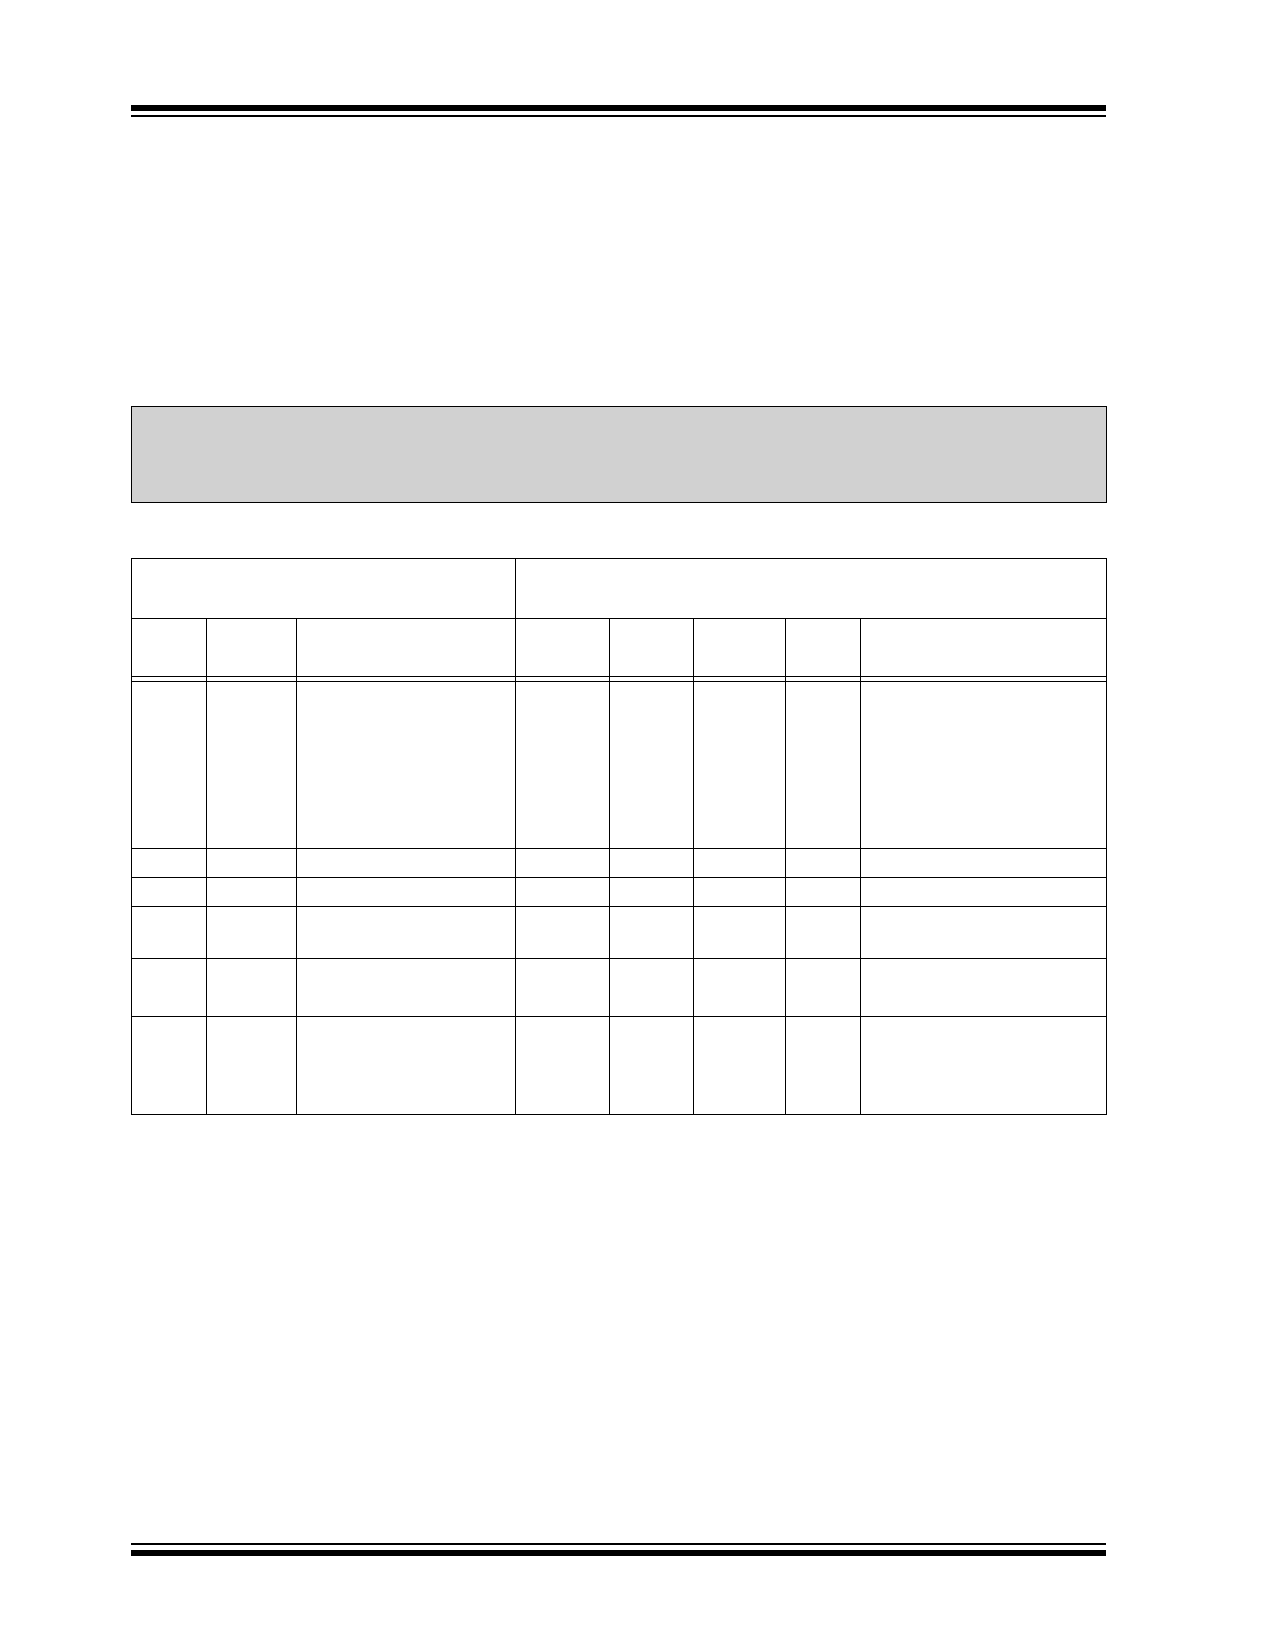 24AA01 pdf, schematic